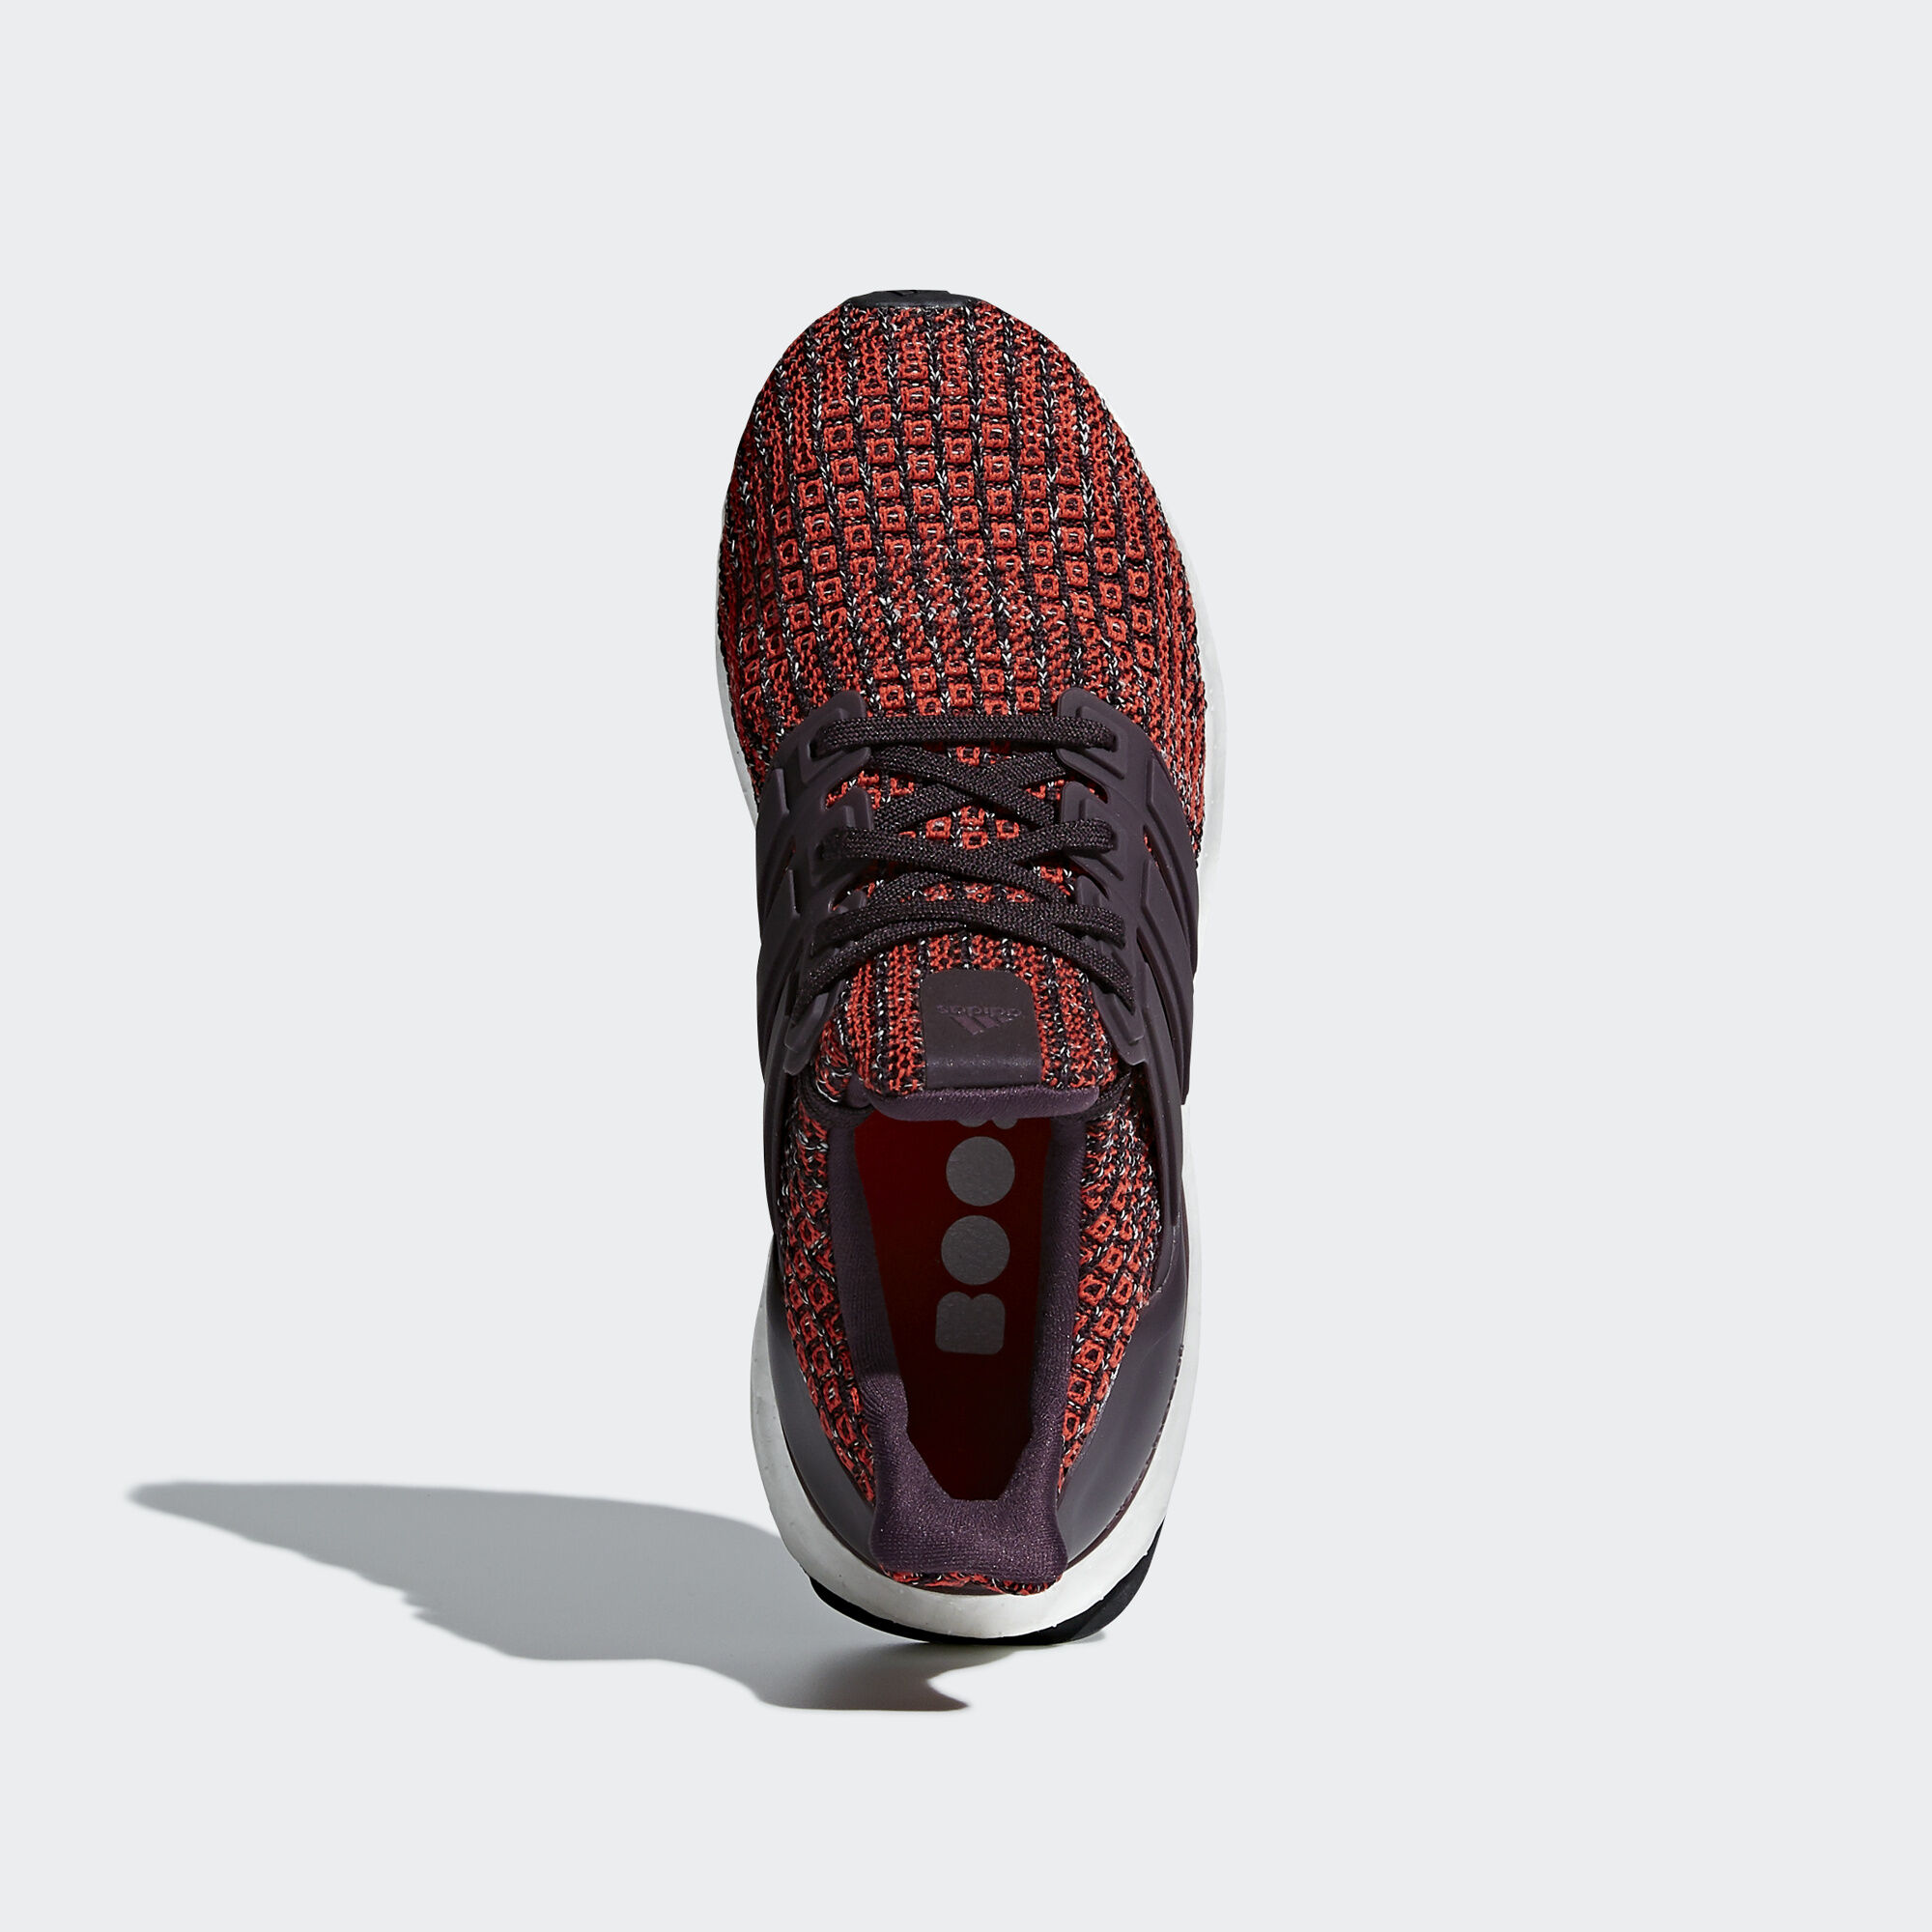 Adidas ultraboost scarpe rosse adidas asia / medio oriente